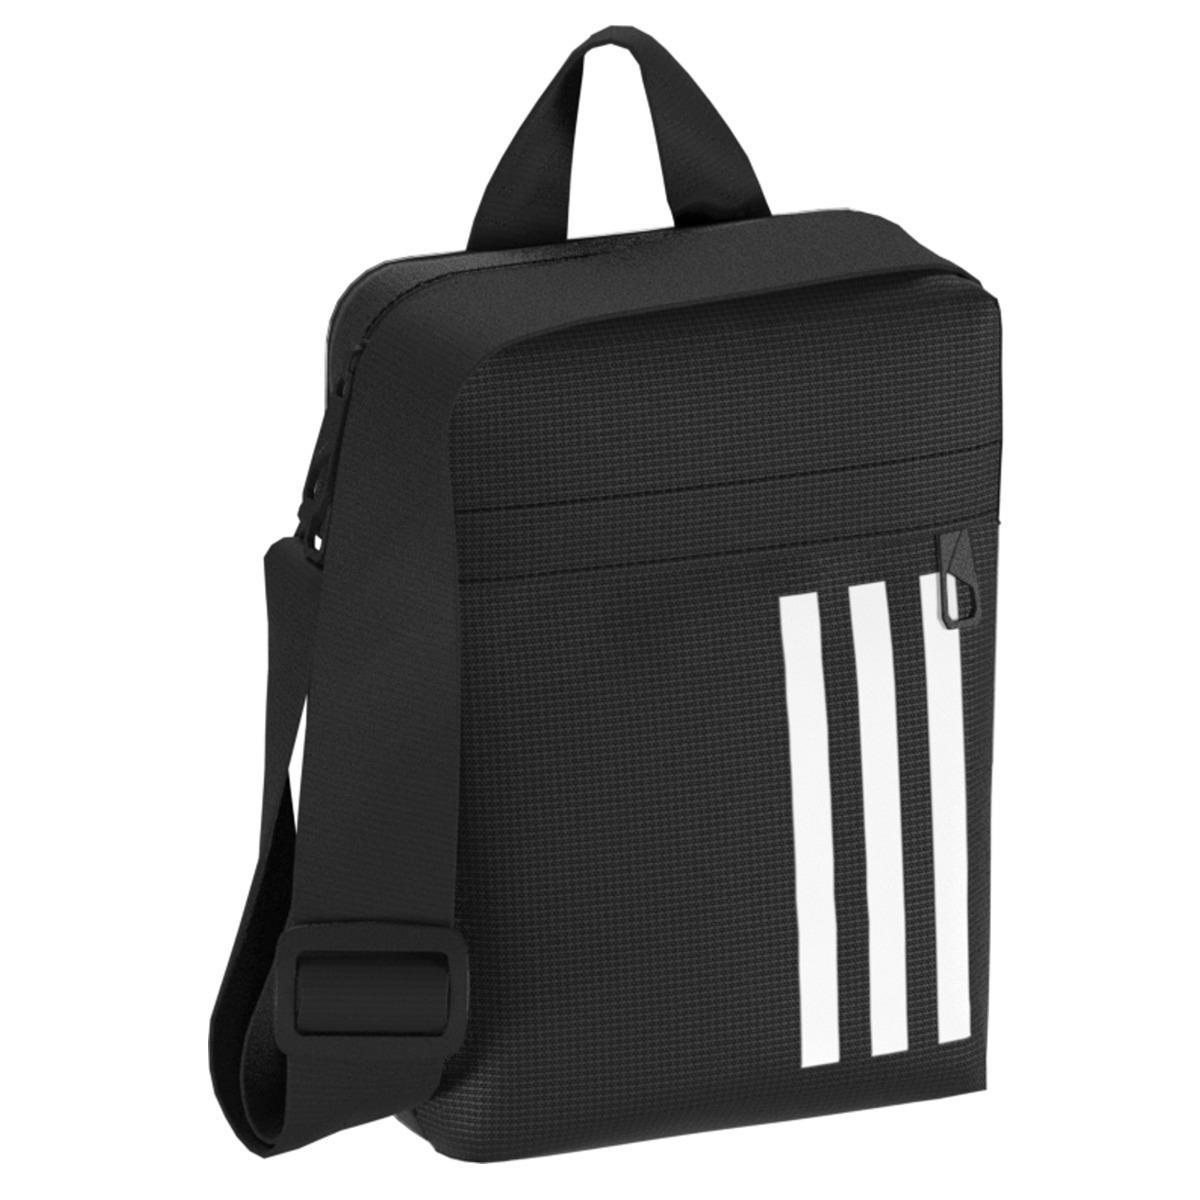 Shoe Bag for Black Adidas in Stripes Real Madrid 3 Lyst Men 4YXTWCzpT 597ffa9d14025